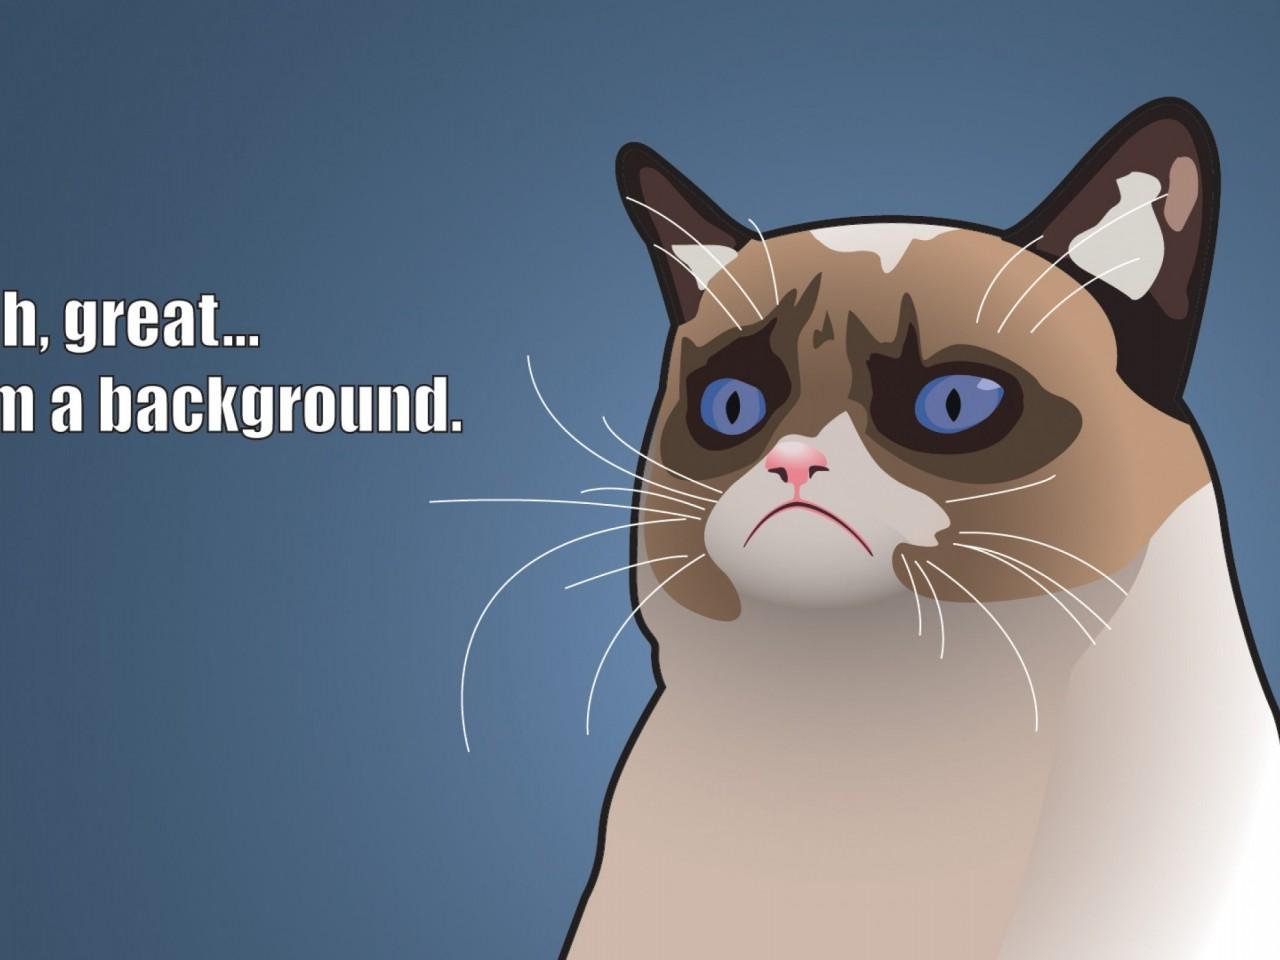 Funny Cat Wallpaper Hd Wallpapers